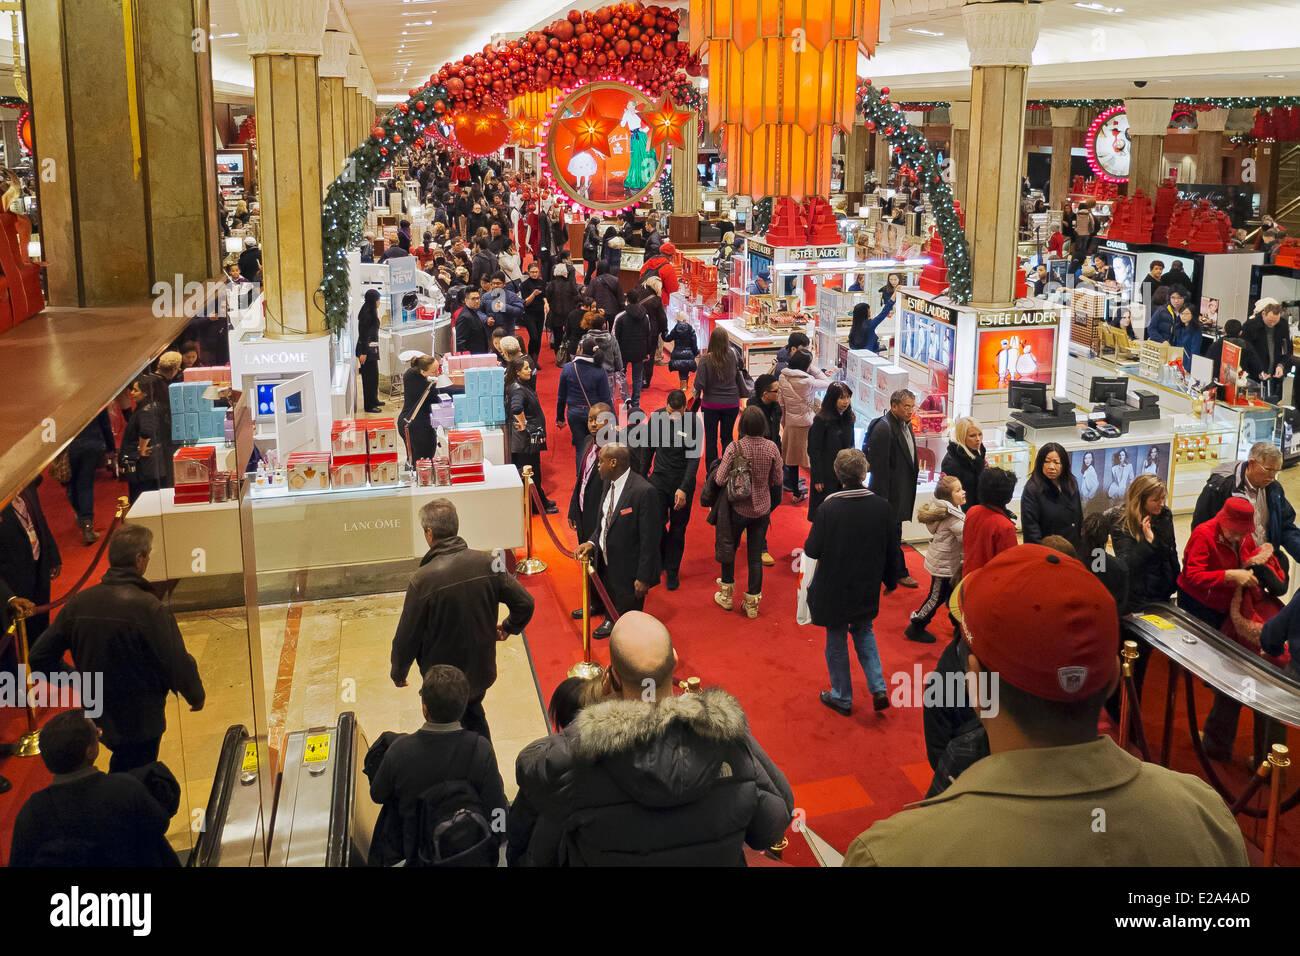 United States, New York, Manhattan, Macy's department store Christmas decorations - Stock Image